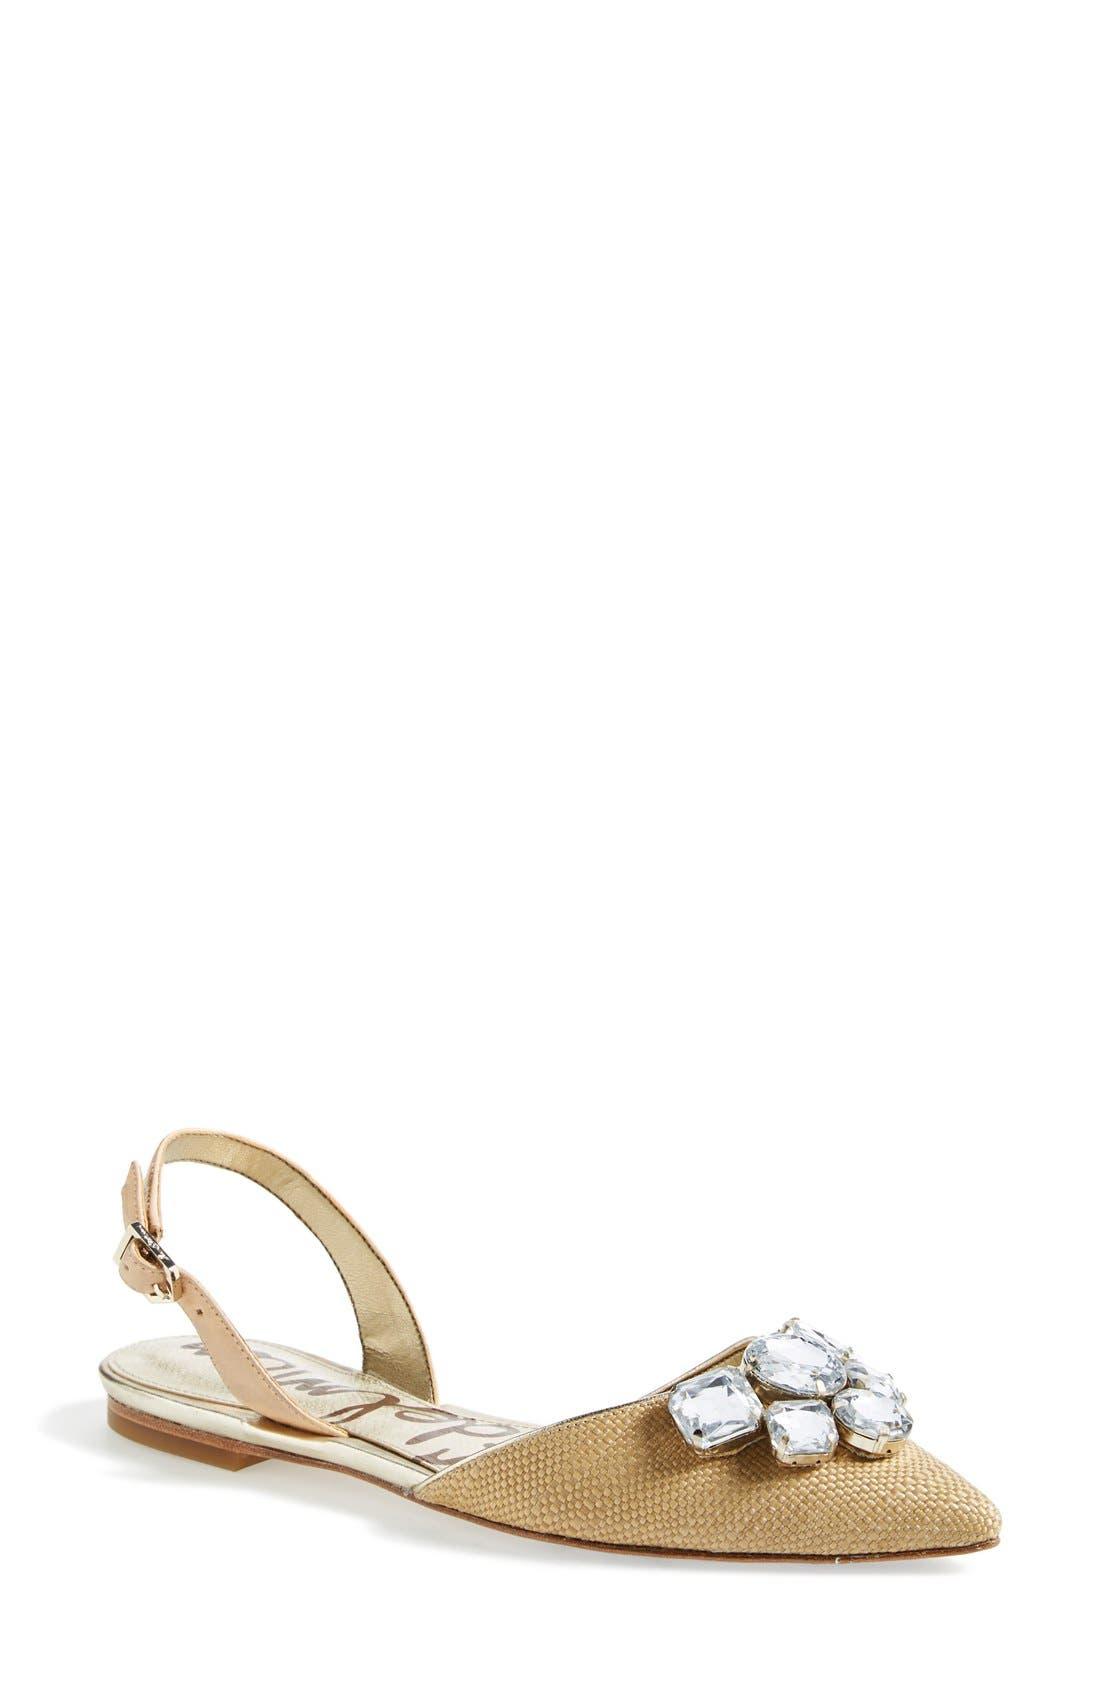 Alternate Image 1 Selected - Sam Edelman 'Reece' Slingback Pointy Toe Flat (Women)